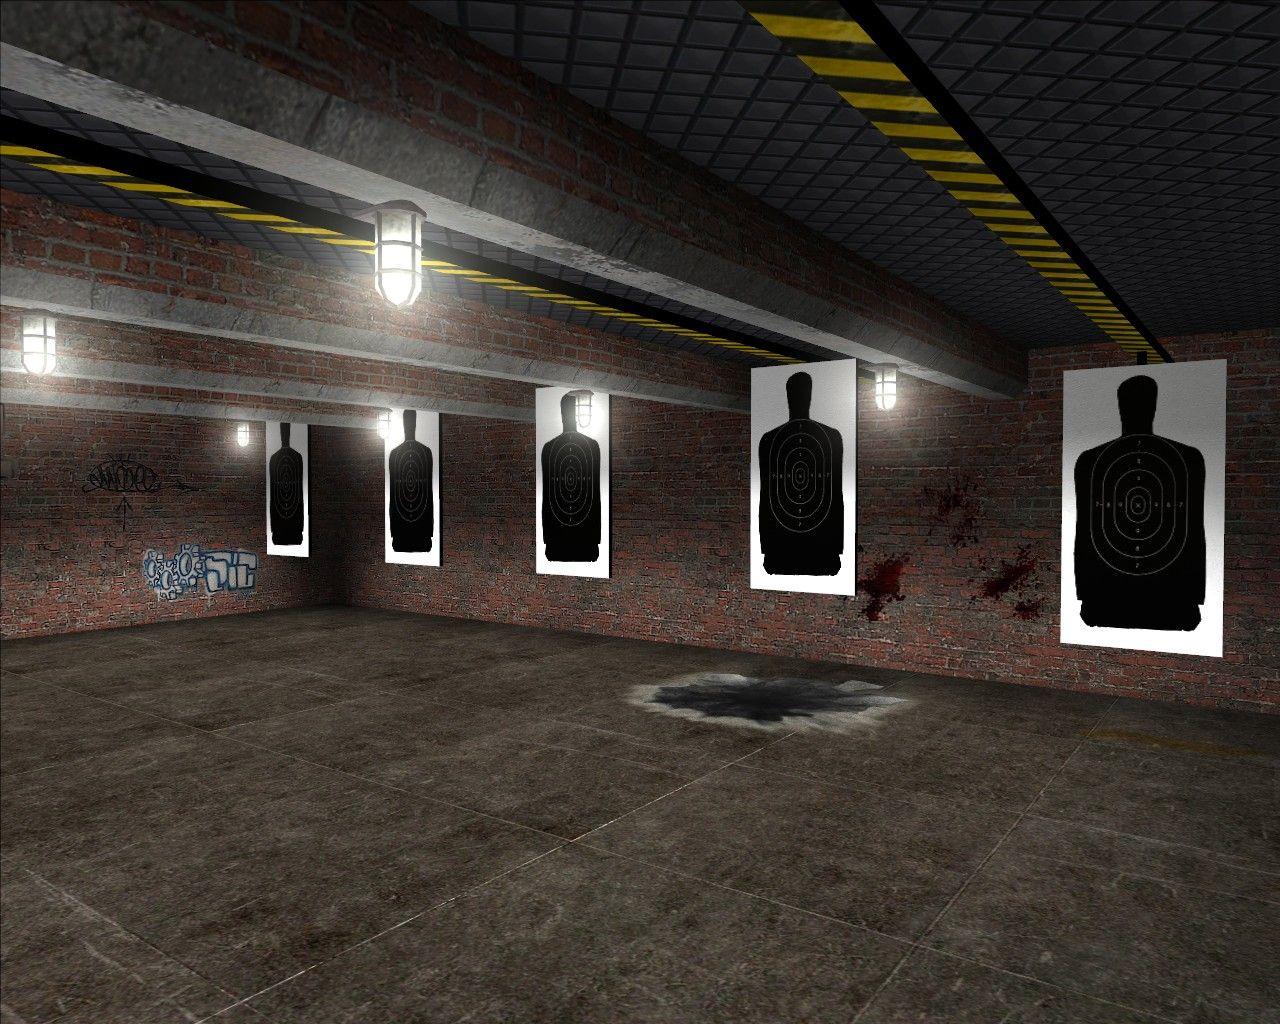 Our Shooting Range Offers 25 Yard Long Shooting Lanes Indoor Shooting Range Firing Range Shooting Range